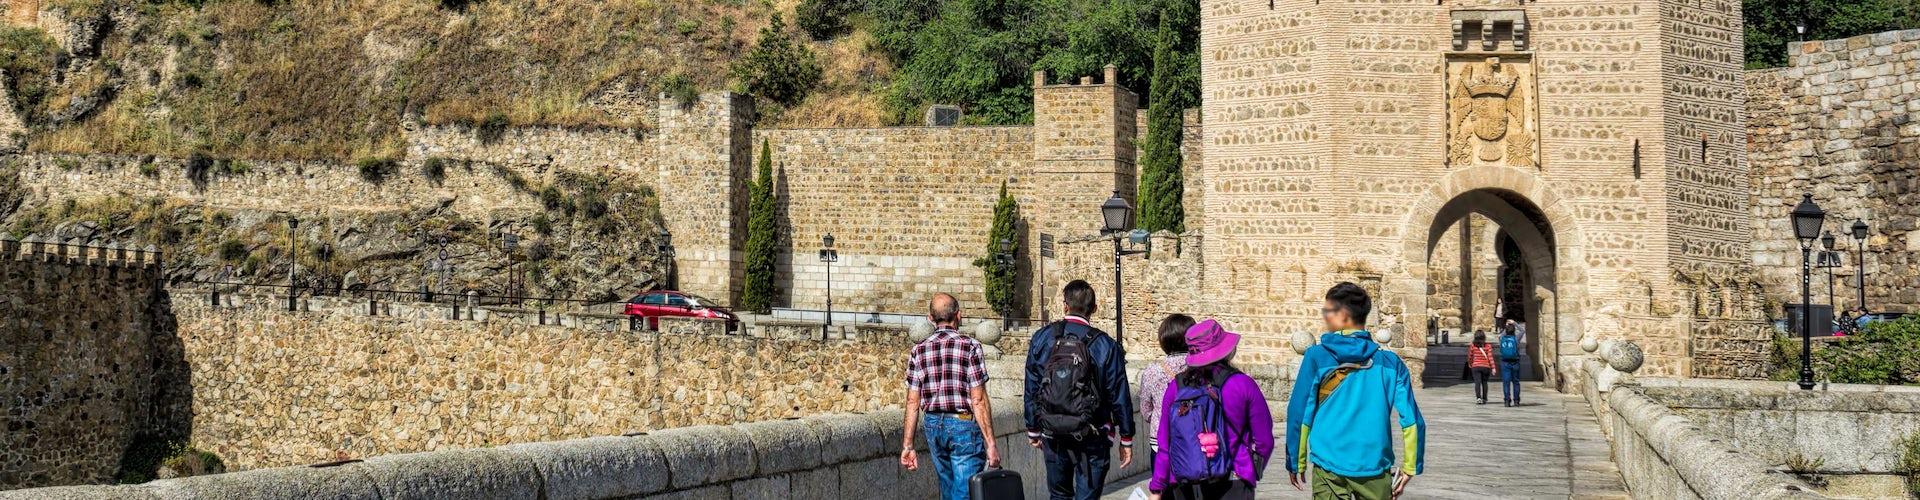 Visita Excursion Toledo